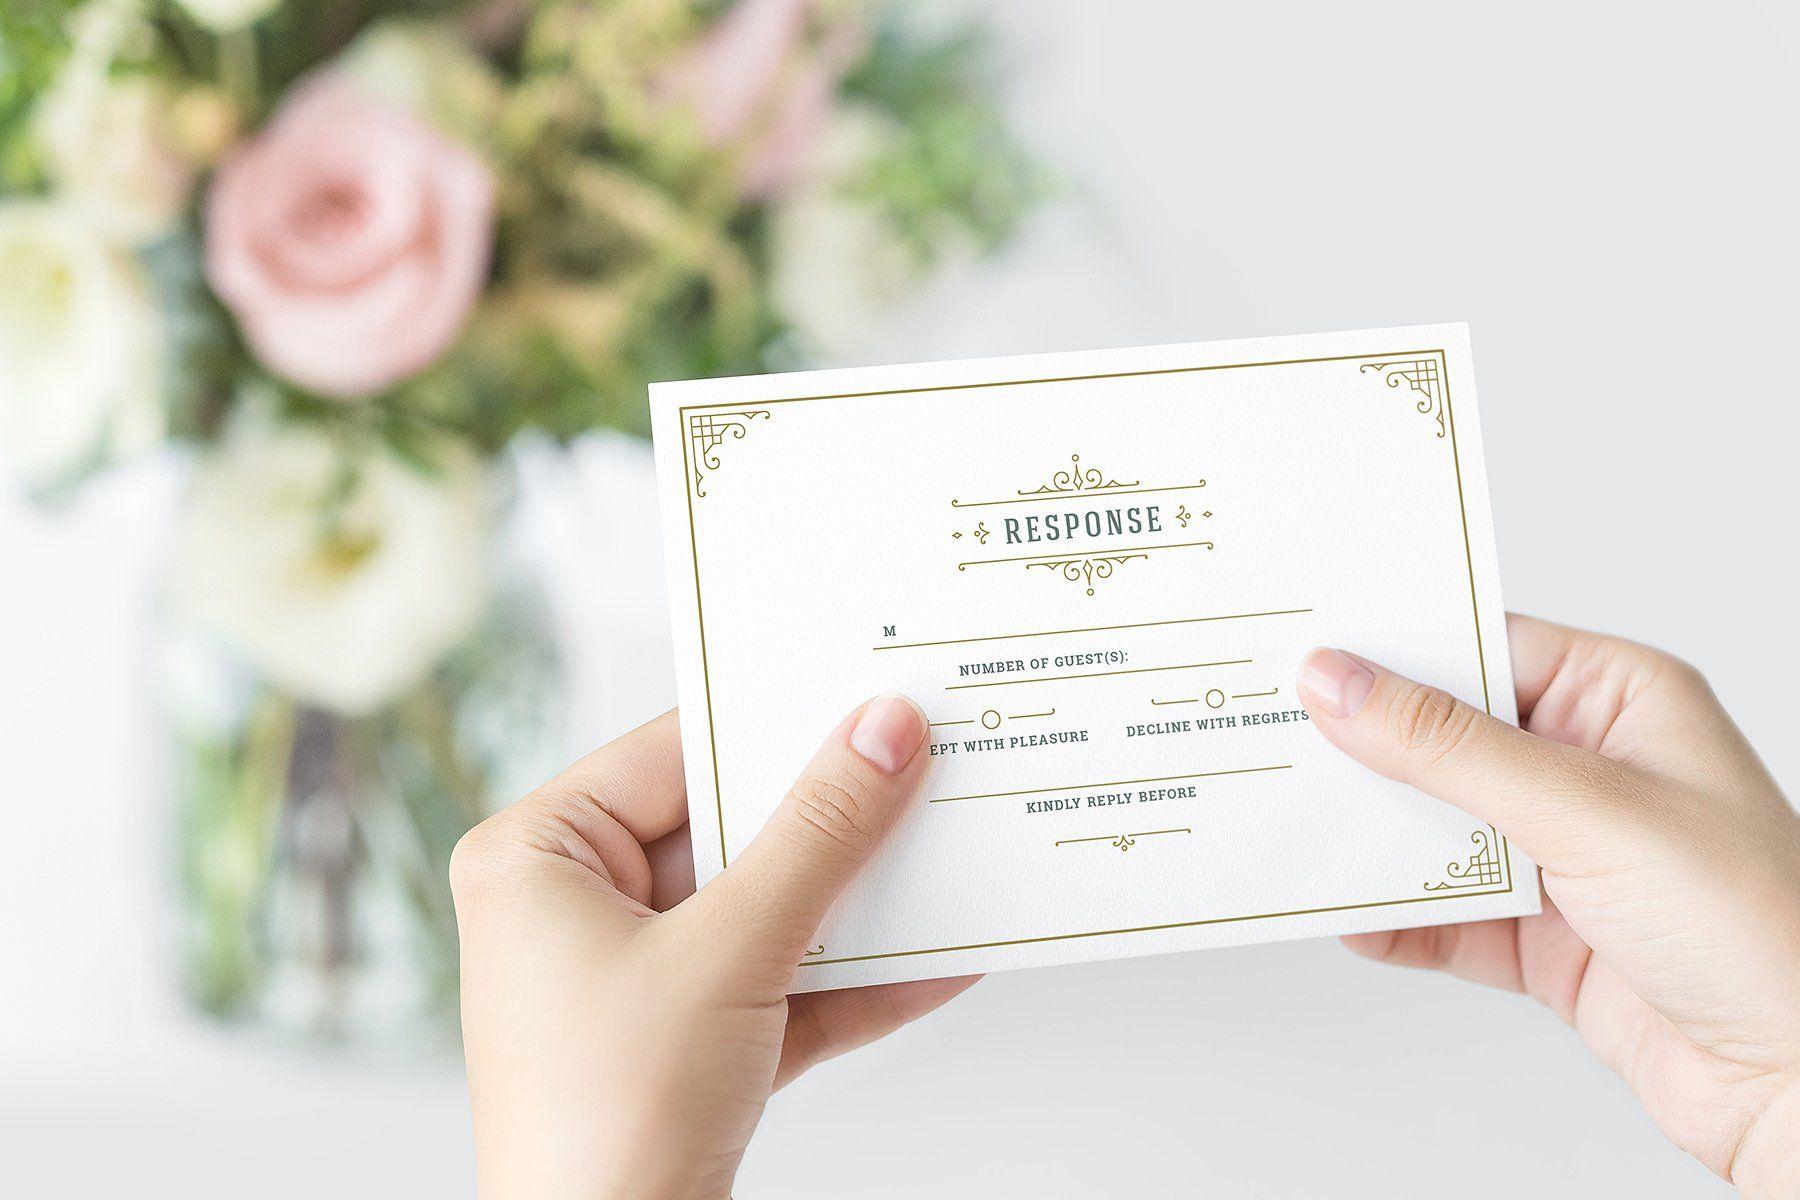 3028567d457c330f397593579ad8226d: Vintage Flourish Wedding Invitations Diy At Reisefeber.org